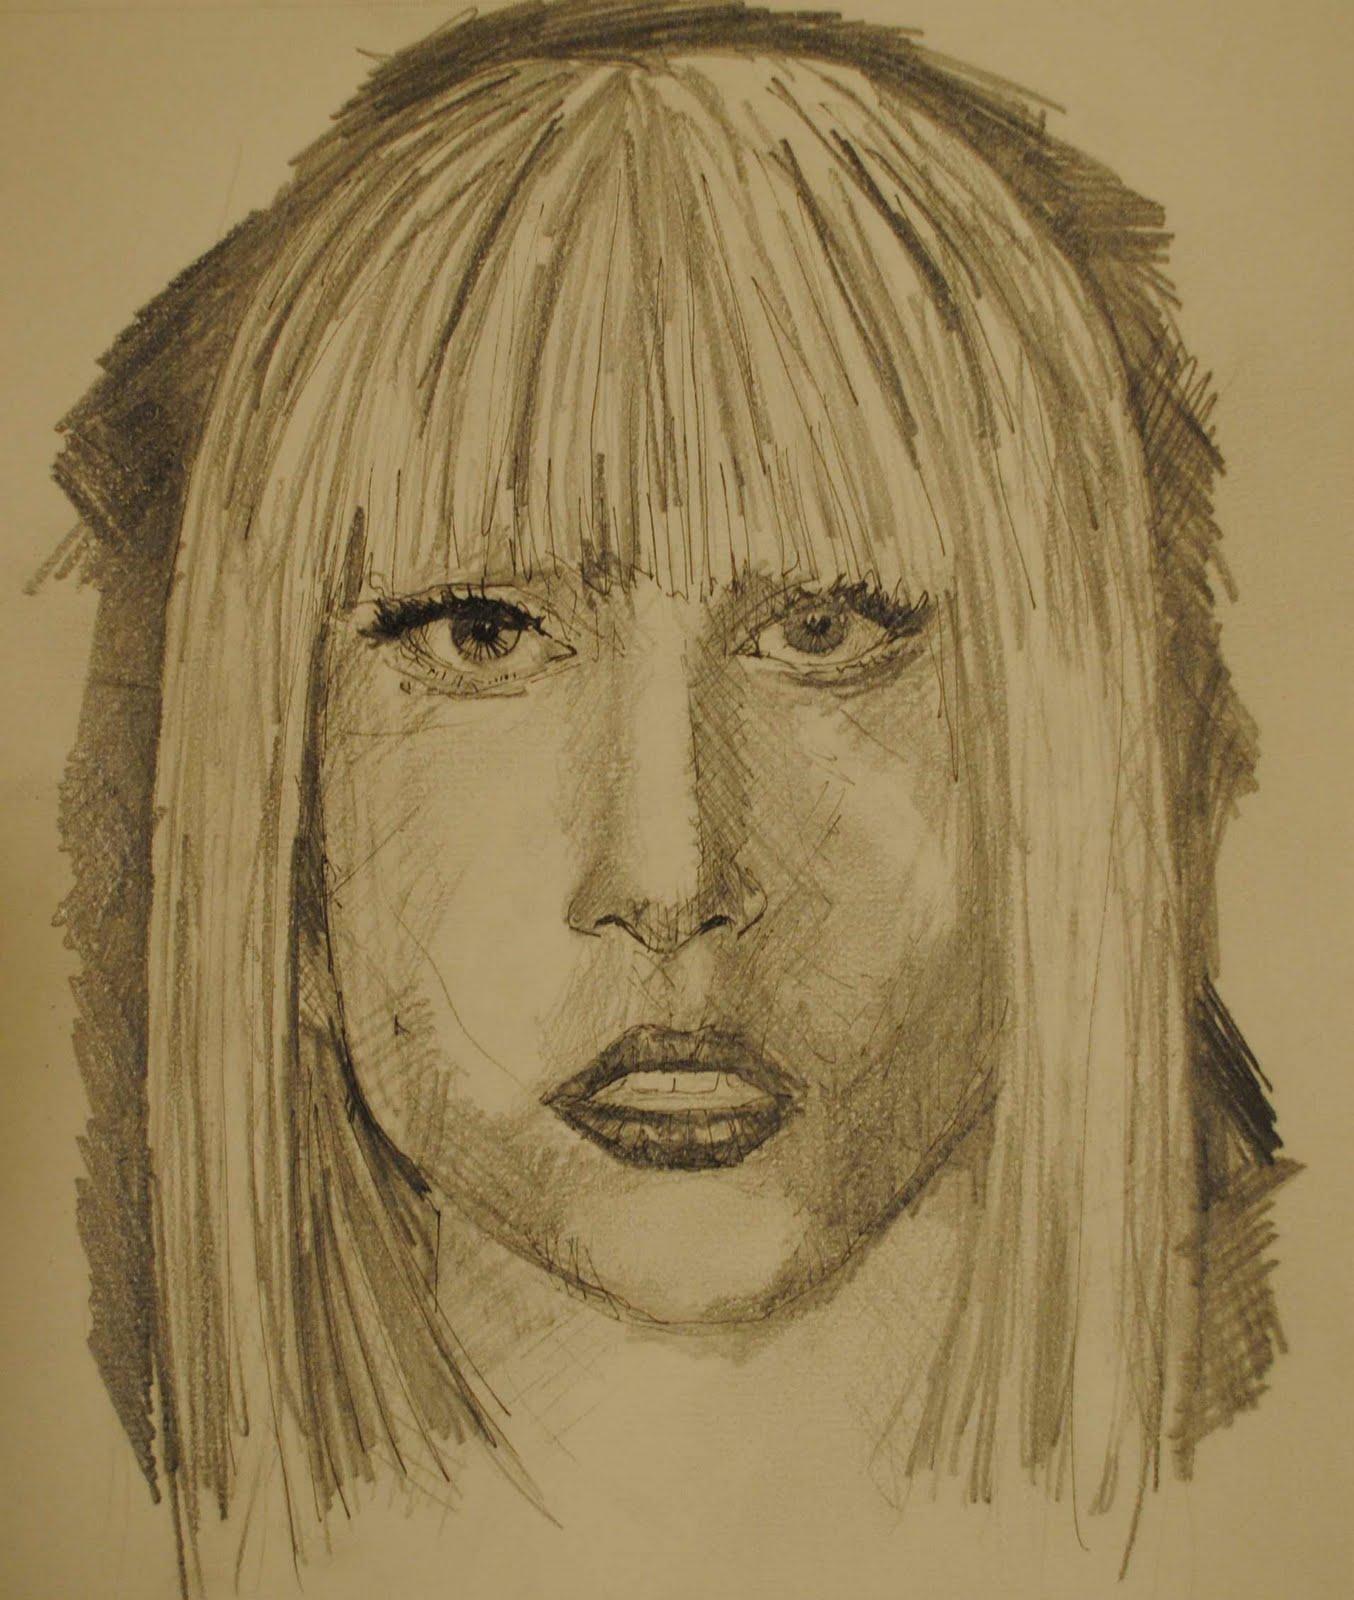 http://1.bp.blogspot.com/__J9neP8q_9k/TC-07KYDGNI/AAAAAAAAAEA/5jJdilev3Uk/s1600/lady-gaga-sketch.jpg